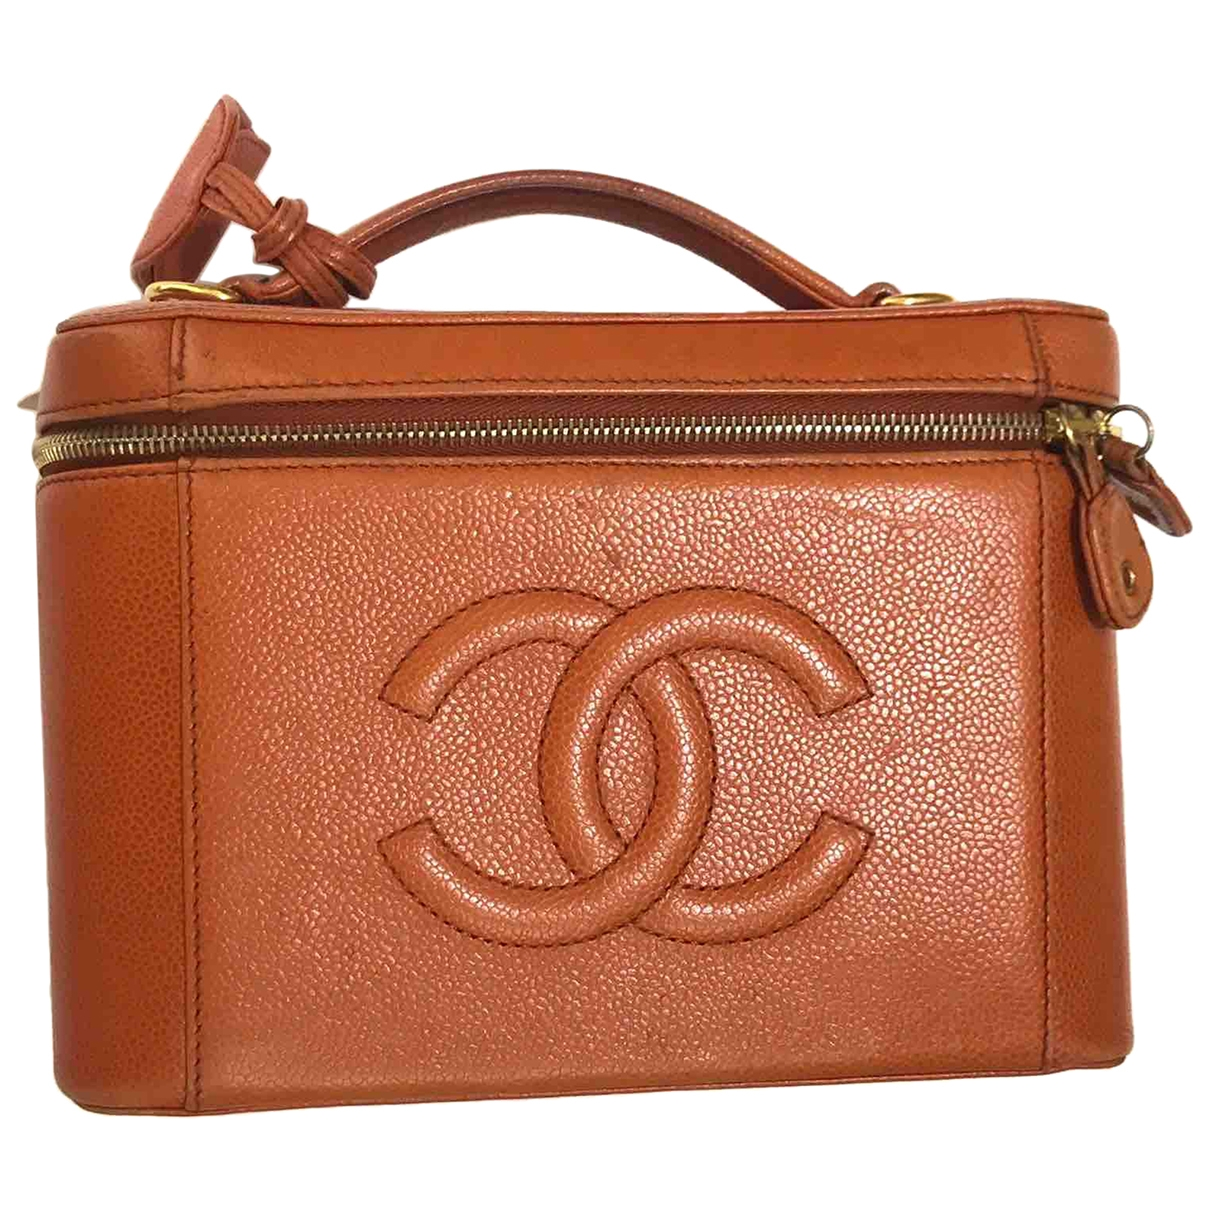 Chanel \N Orange Leather handbag for Women \N